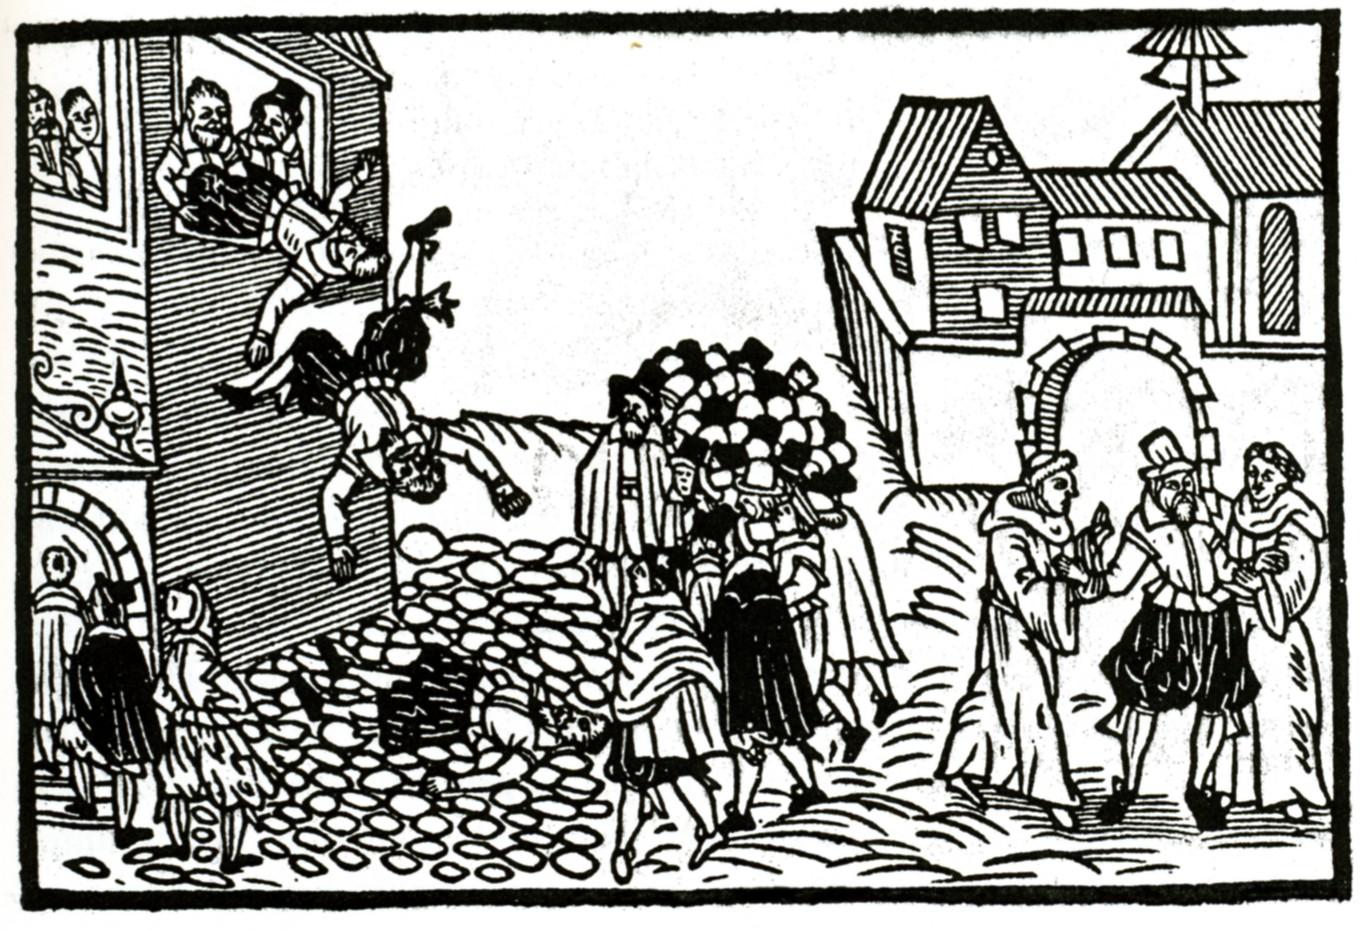 Pražská defenestrace v roce 1618